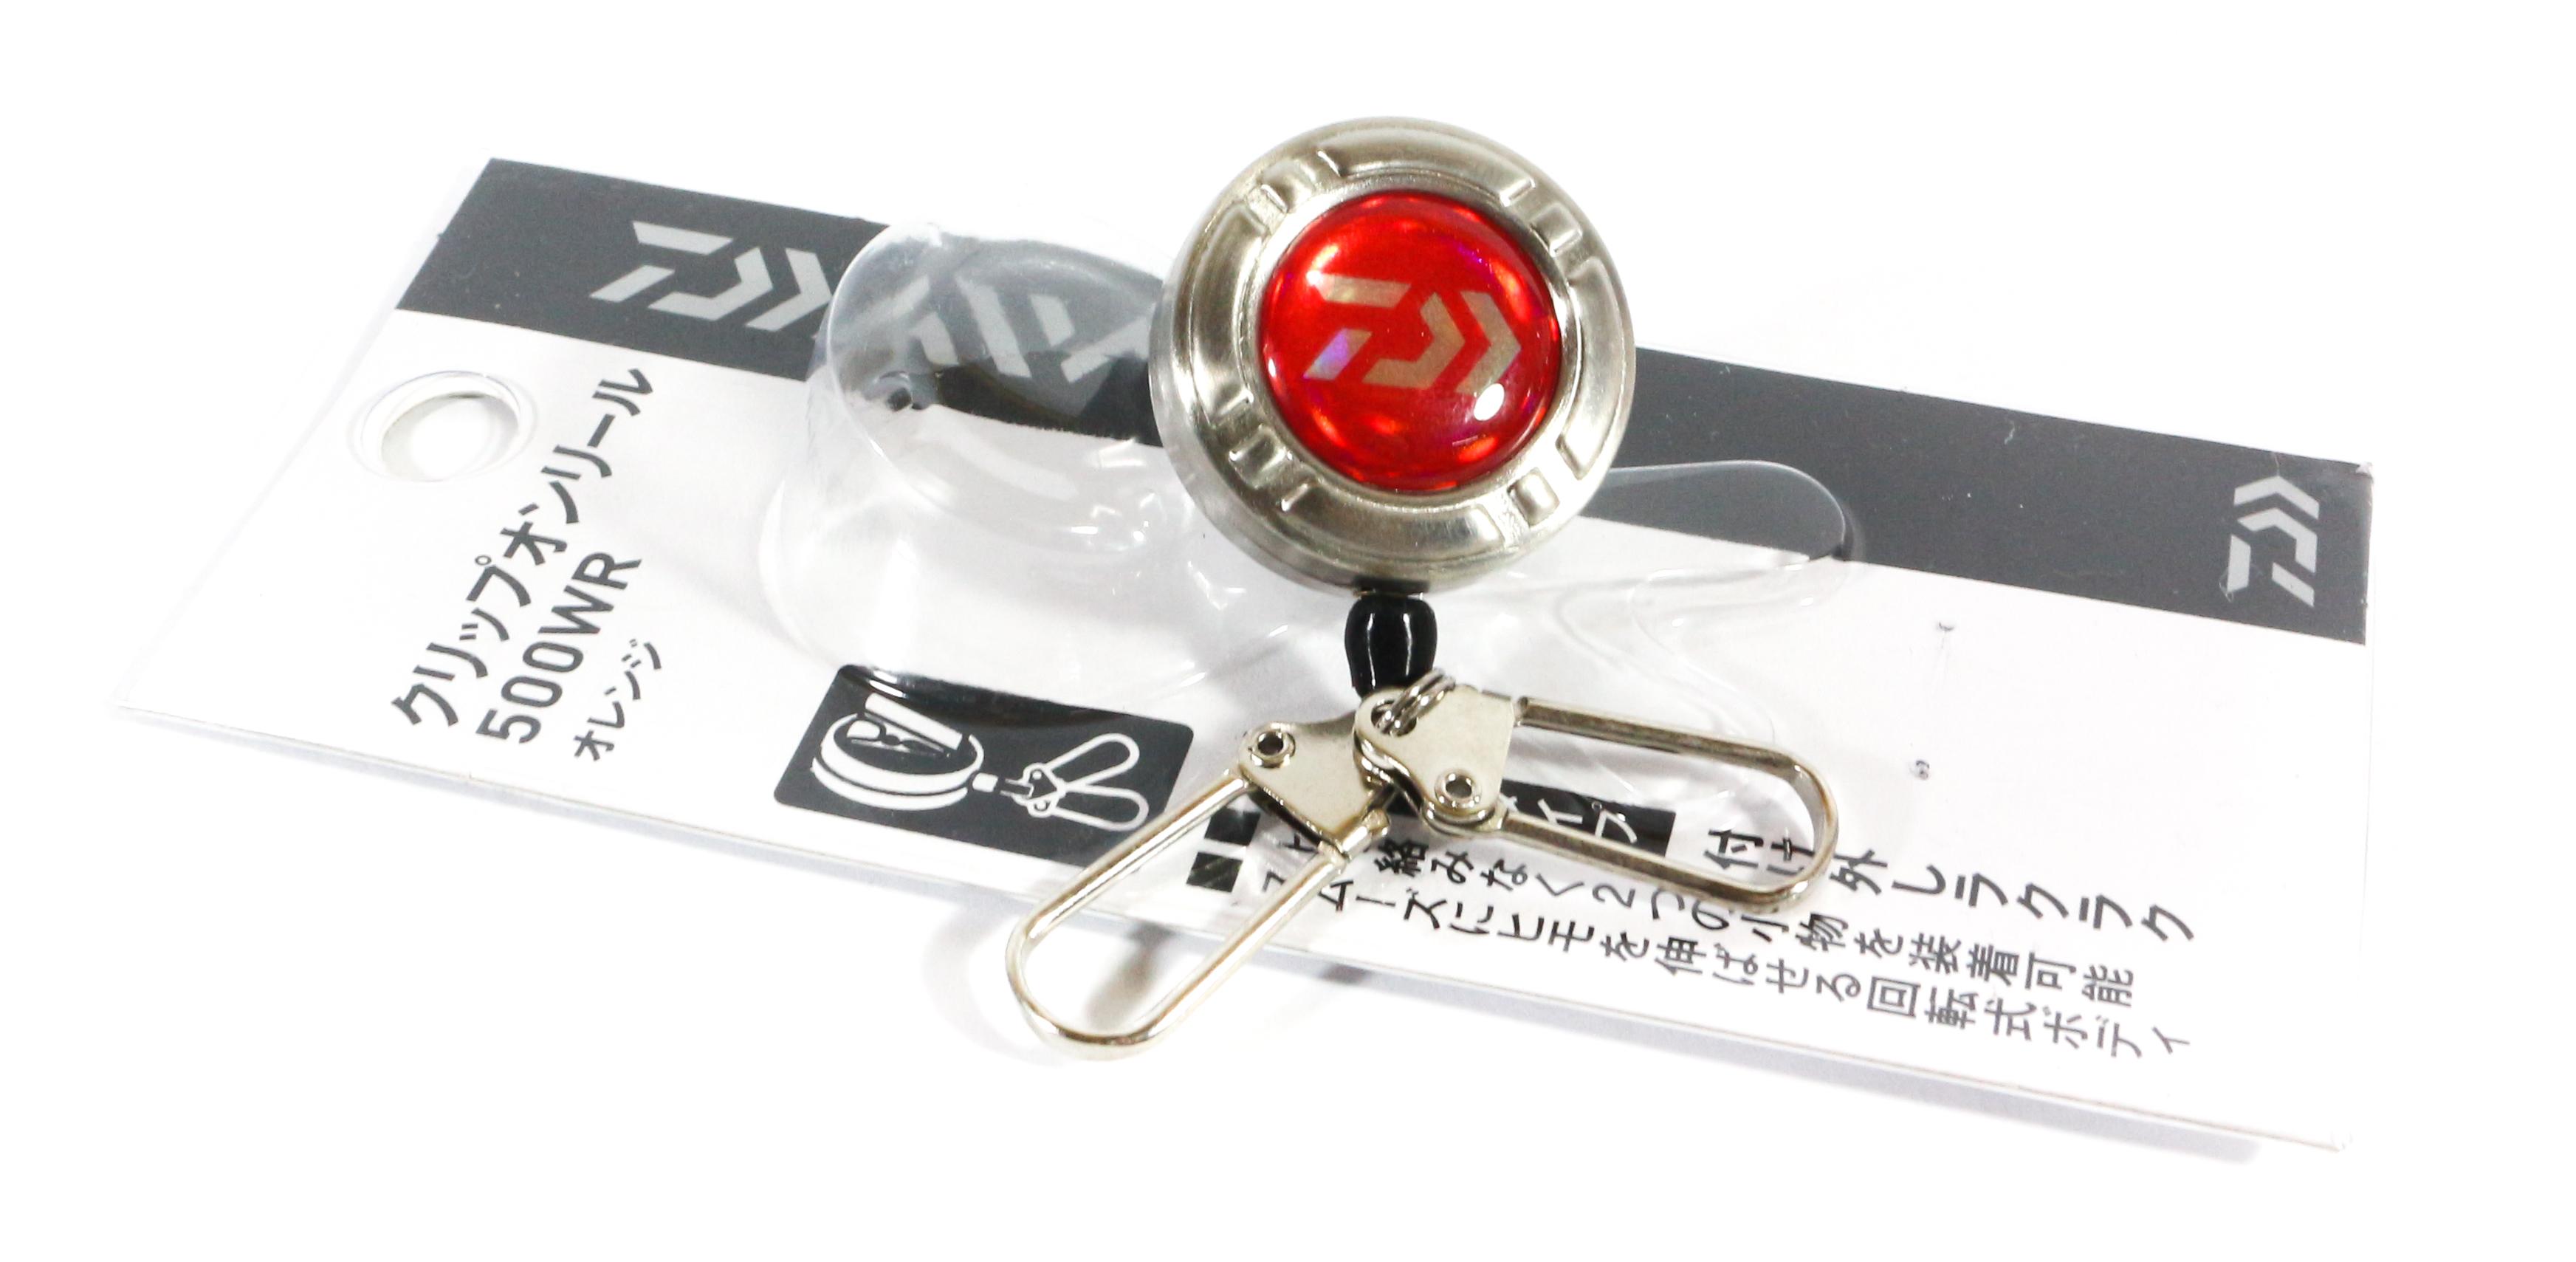 Sale Daiwa 500 WR Pin On Reel Double Hook Type Red (0556)